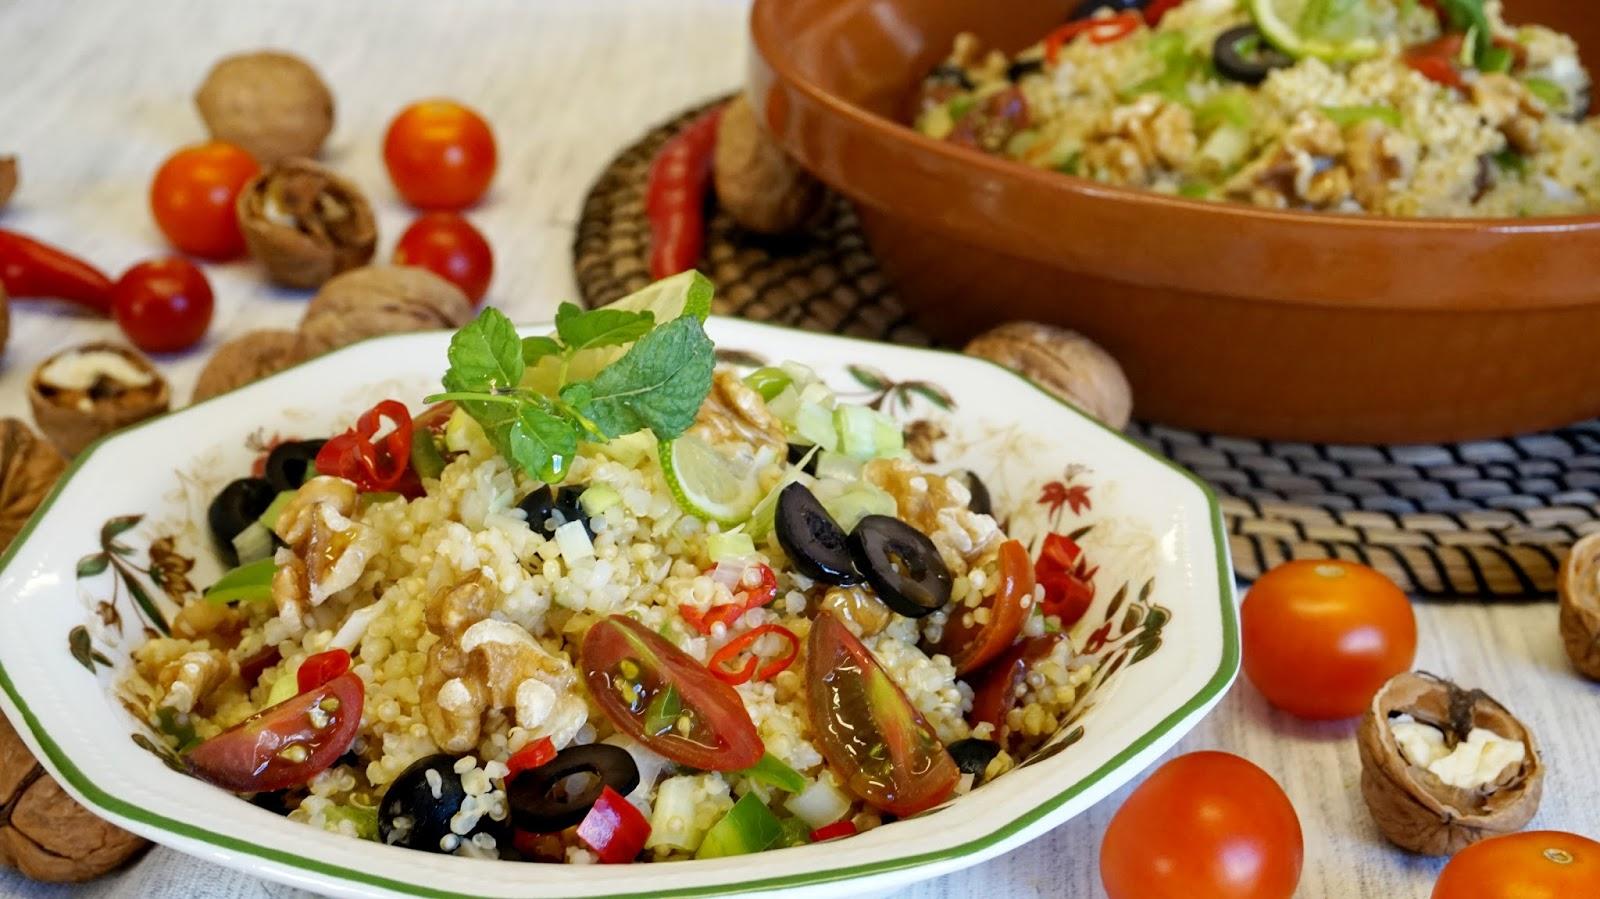 Ensalada de quinoa y bulgur tabouleh la cocina facil for Como se cocina la quinoa para ensalada